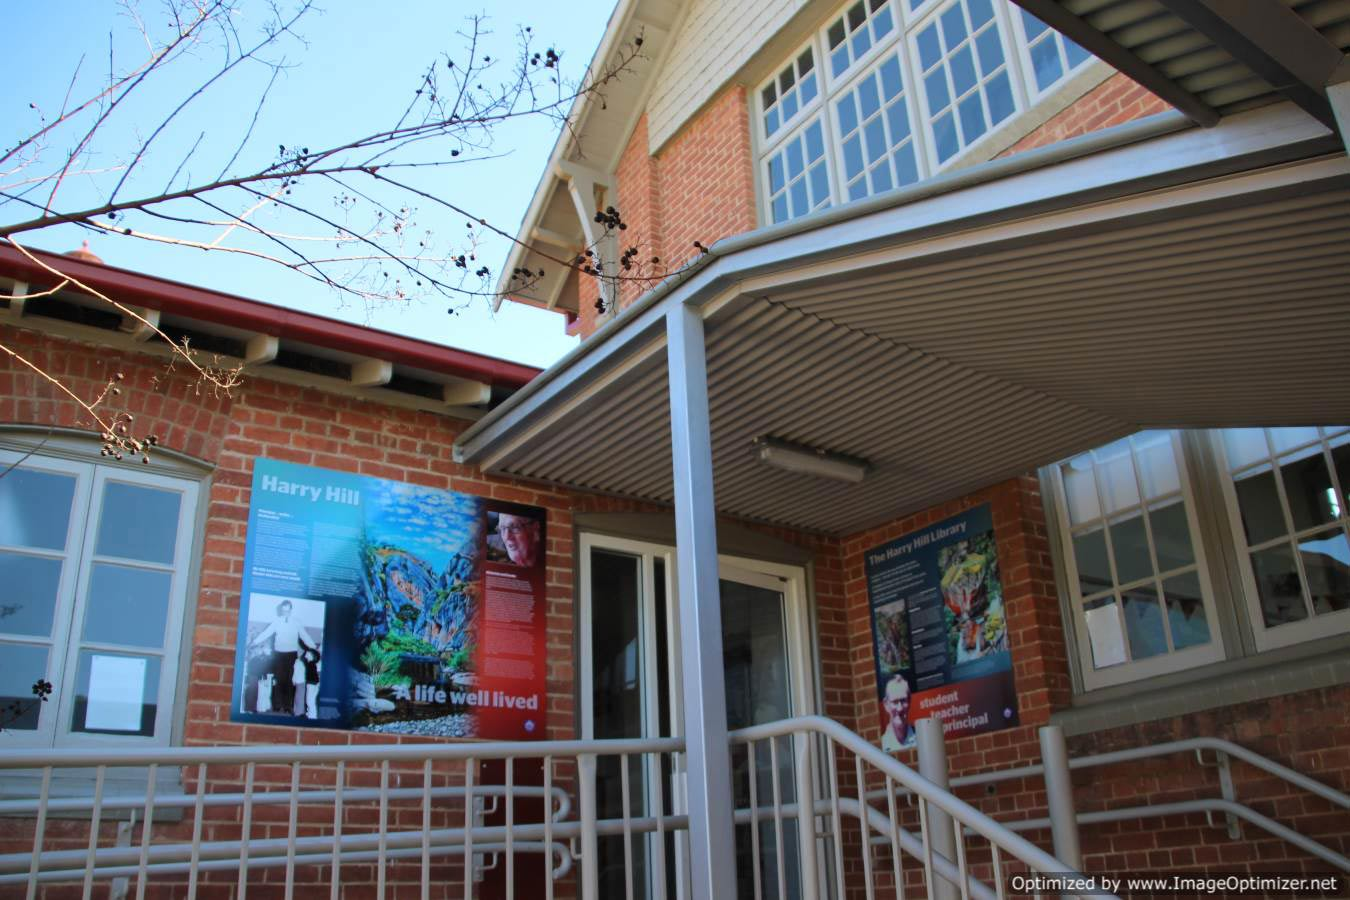 External wall mount signage - Tumut Public School